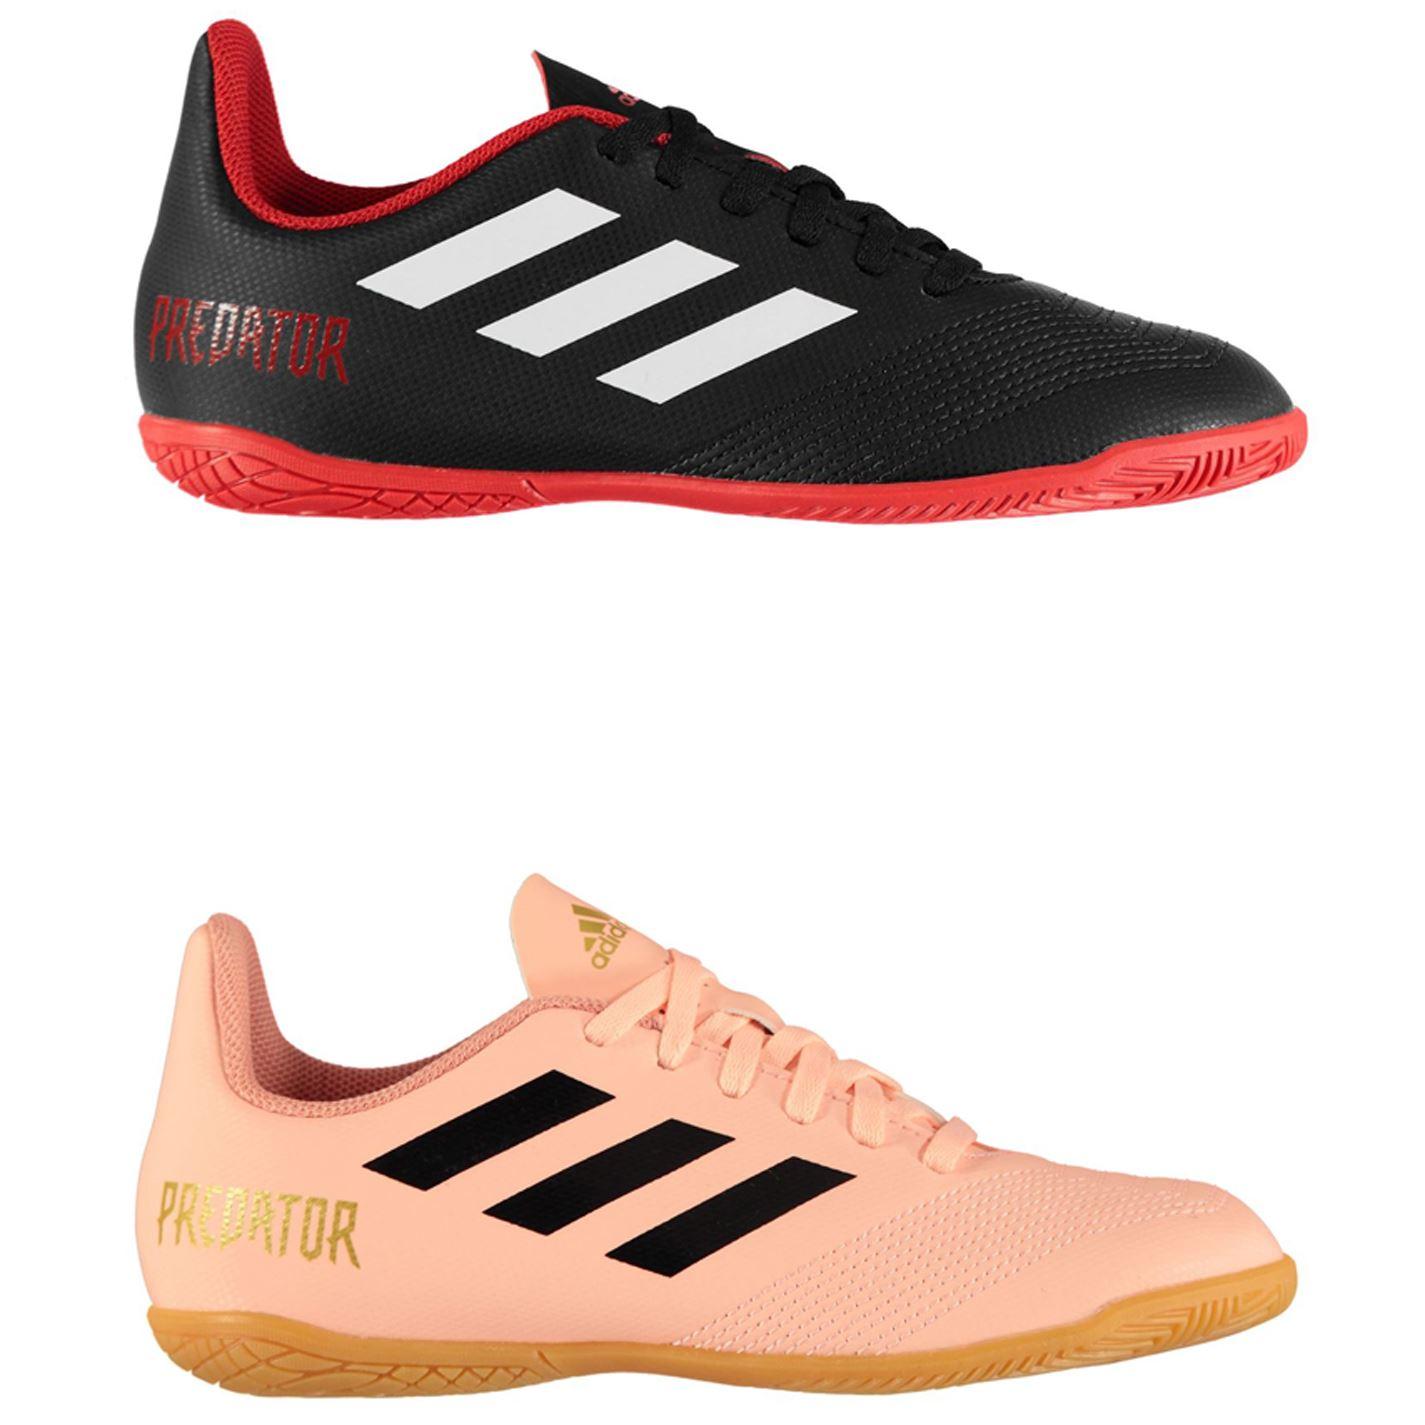 c3d88daeb016 ... adidas Predator Tango 18.4 Indoor Football Trainers Juniors Soccer Shoes  ...